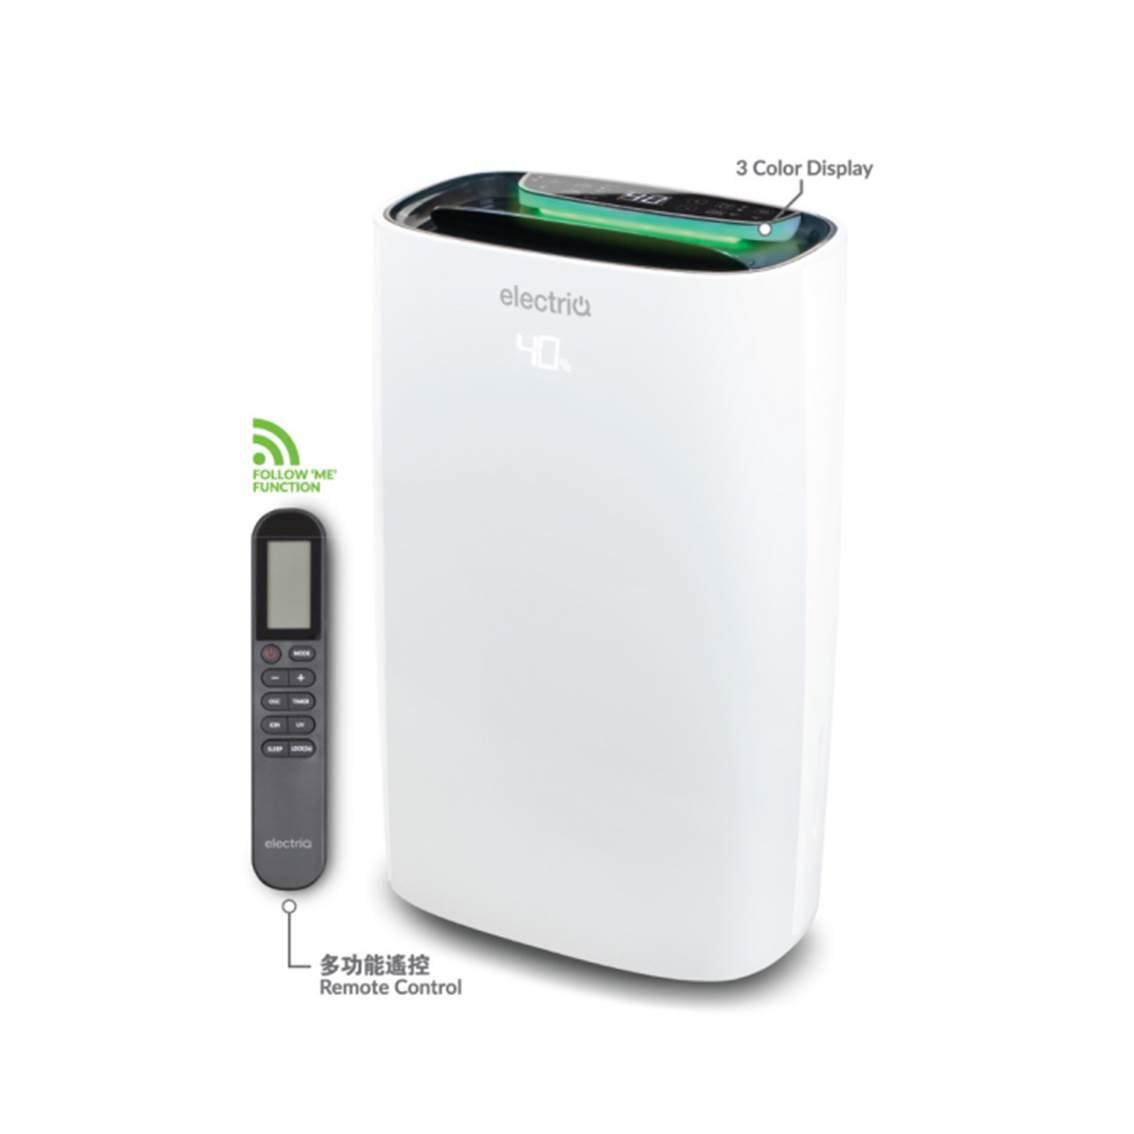 ELECTRIQ2合1空氣淨化抽濕機24公升